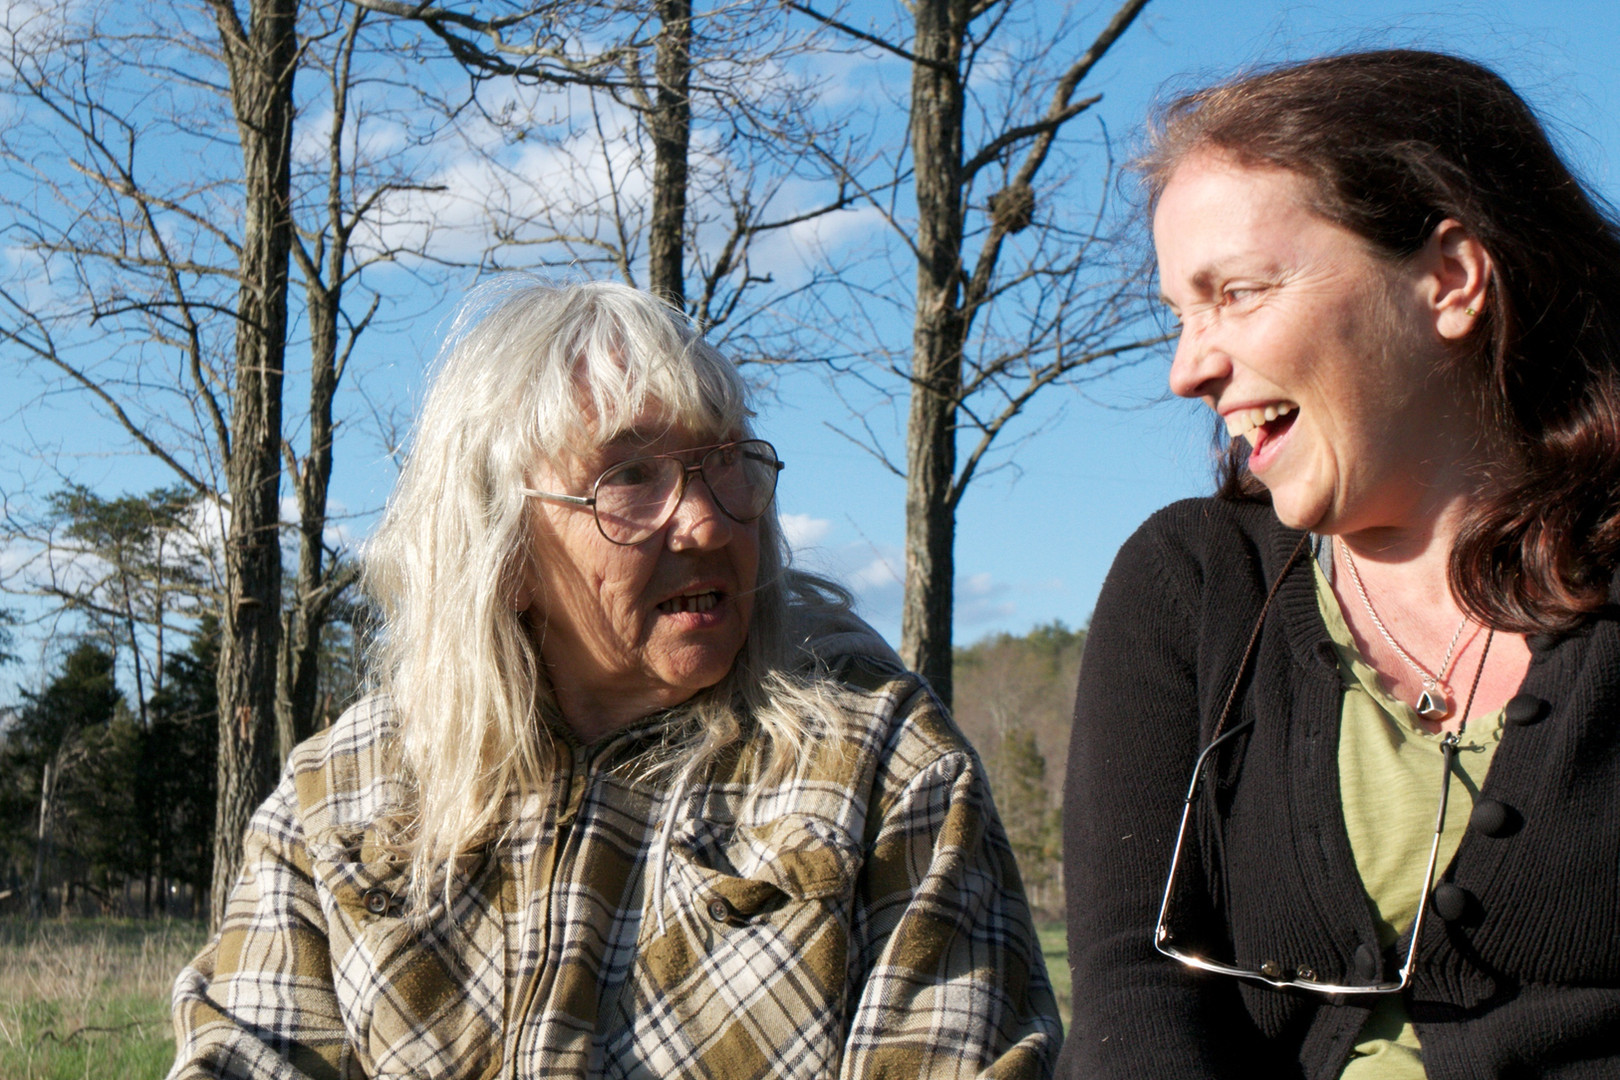 Gail Rose and Kathy